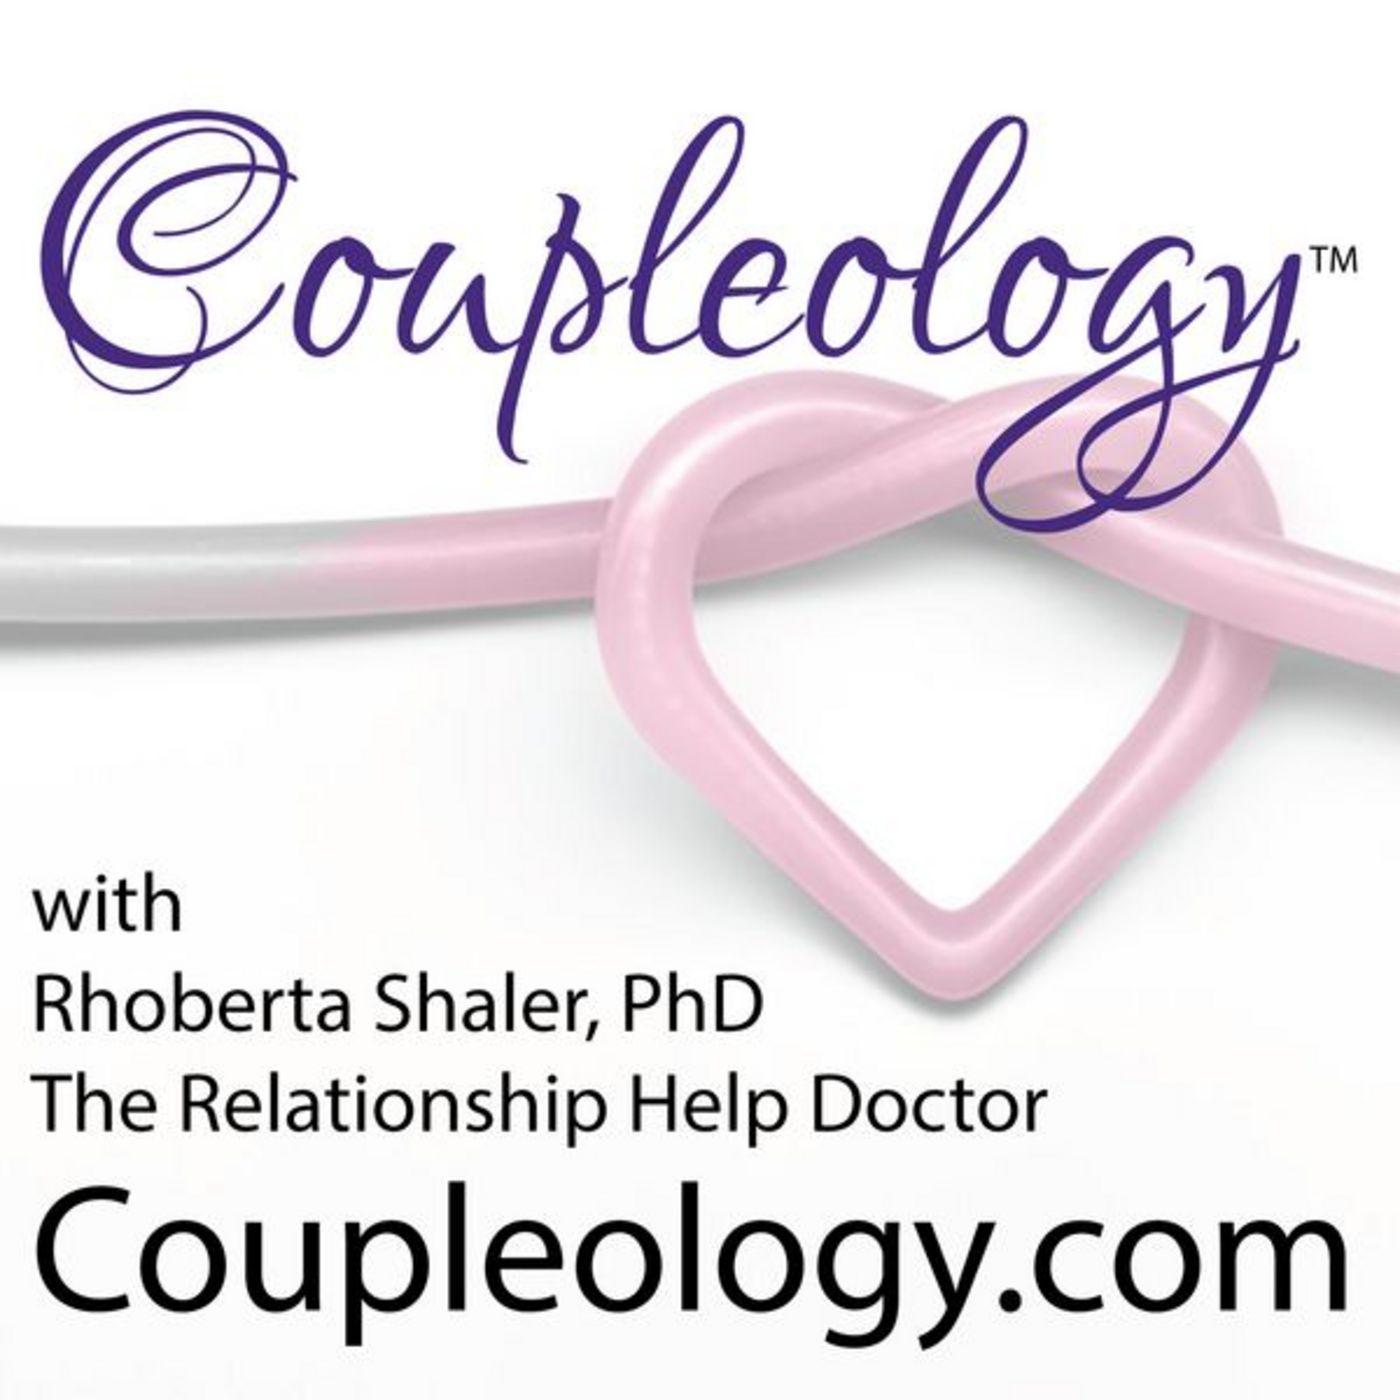 Coupleology | Relationship Advice | Tips For Relationships